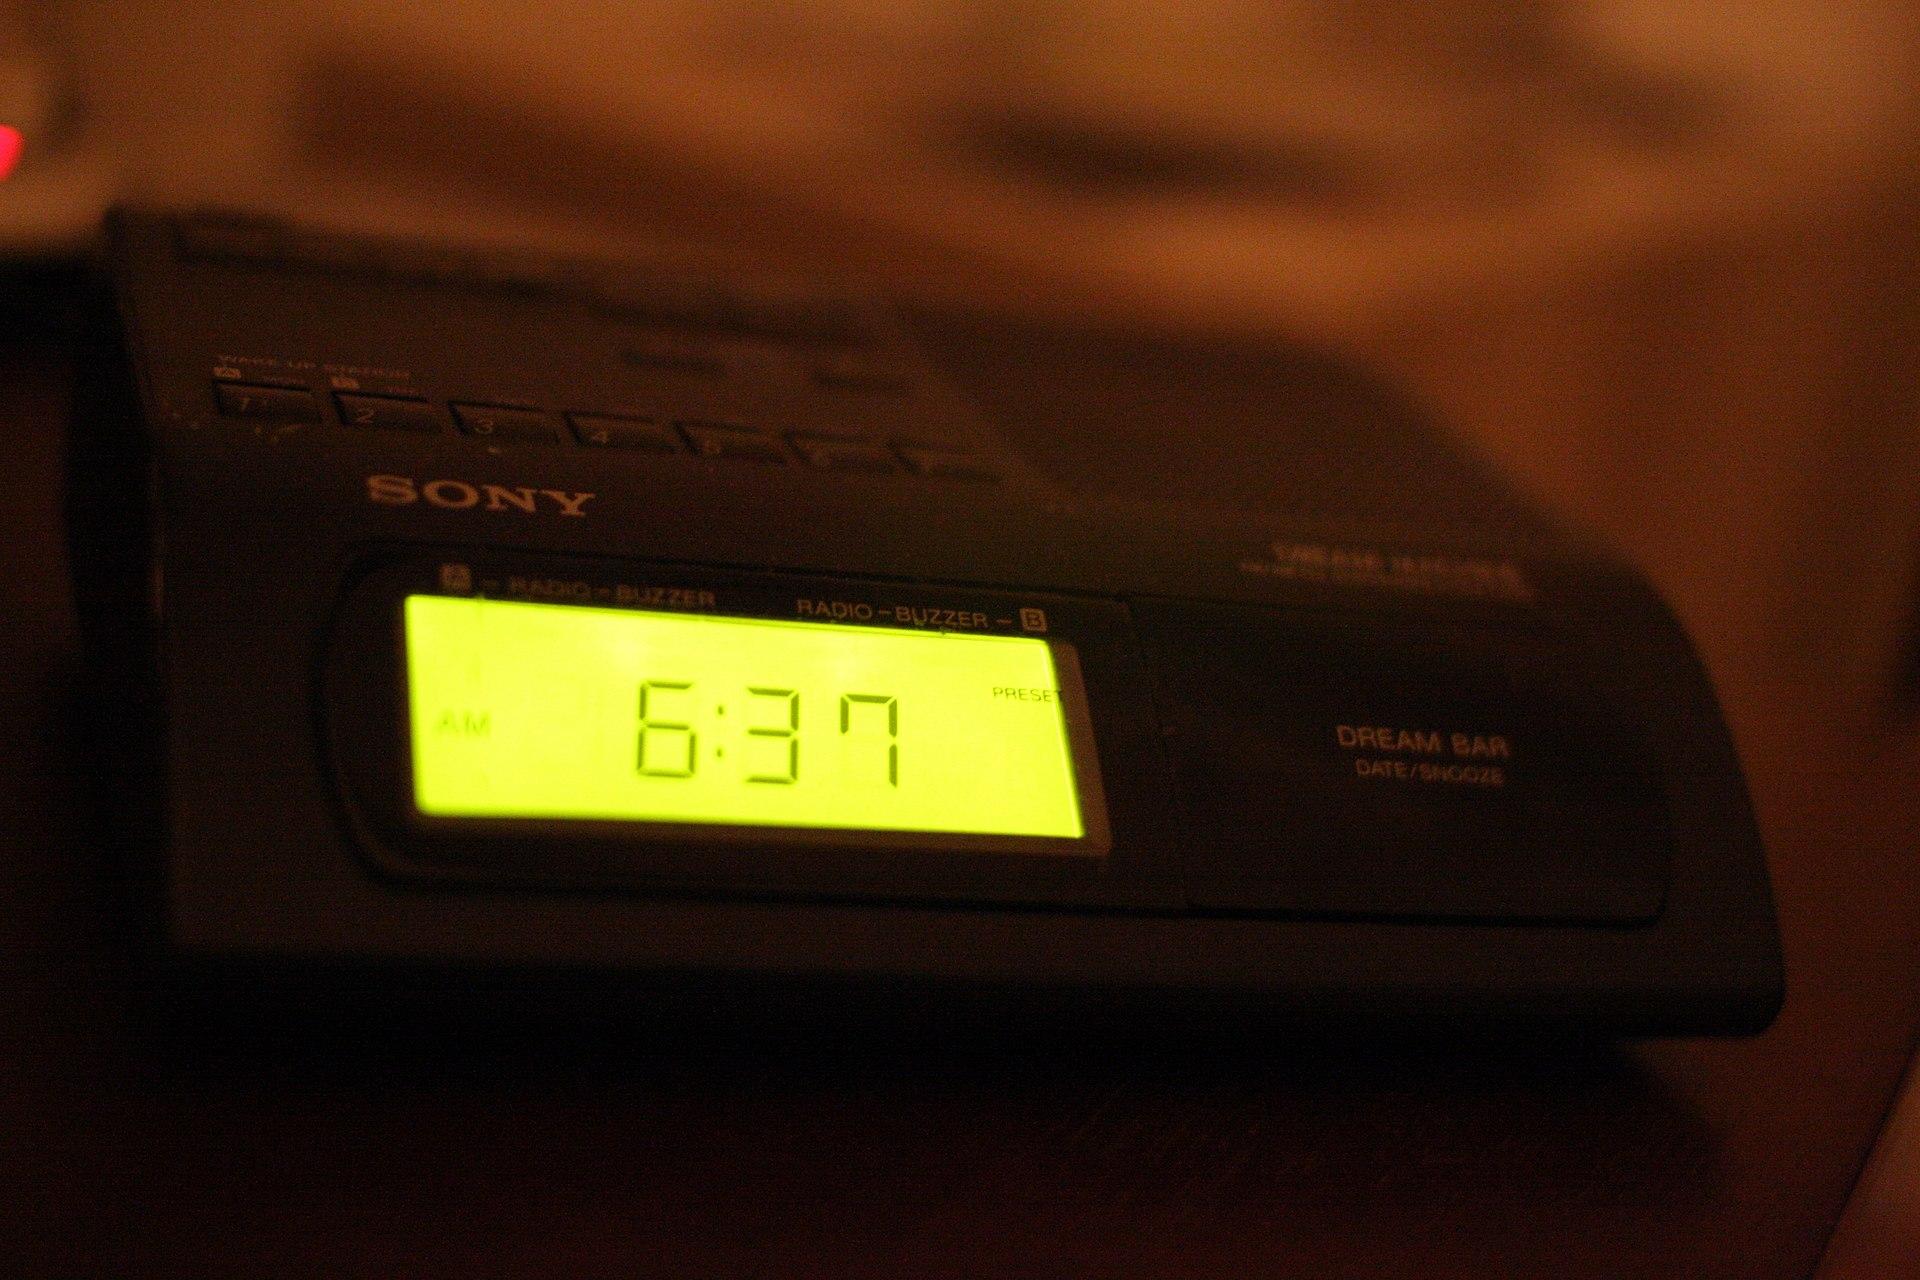 Sony icf c318 clock radio manual